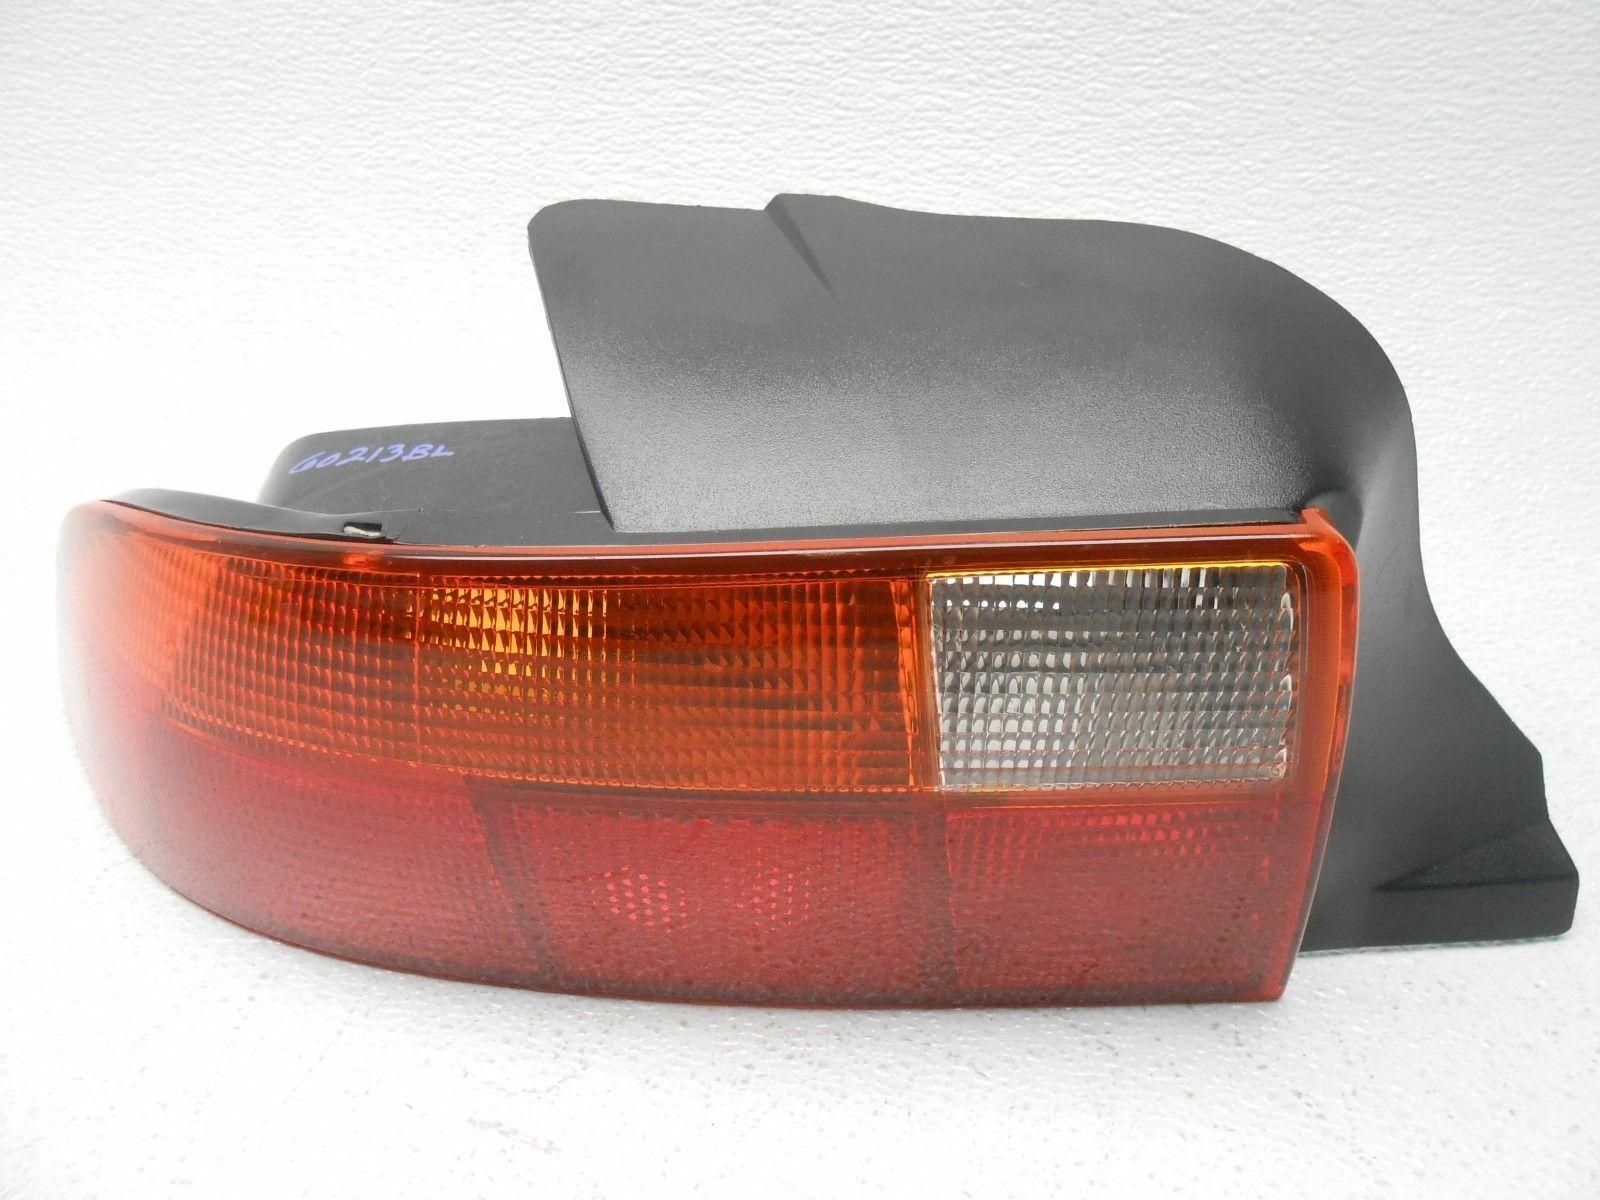 BMW Z3 Roadster 3.2L Left Tail Lamp Light 1999-2002 OEM New